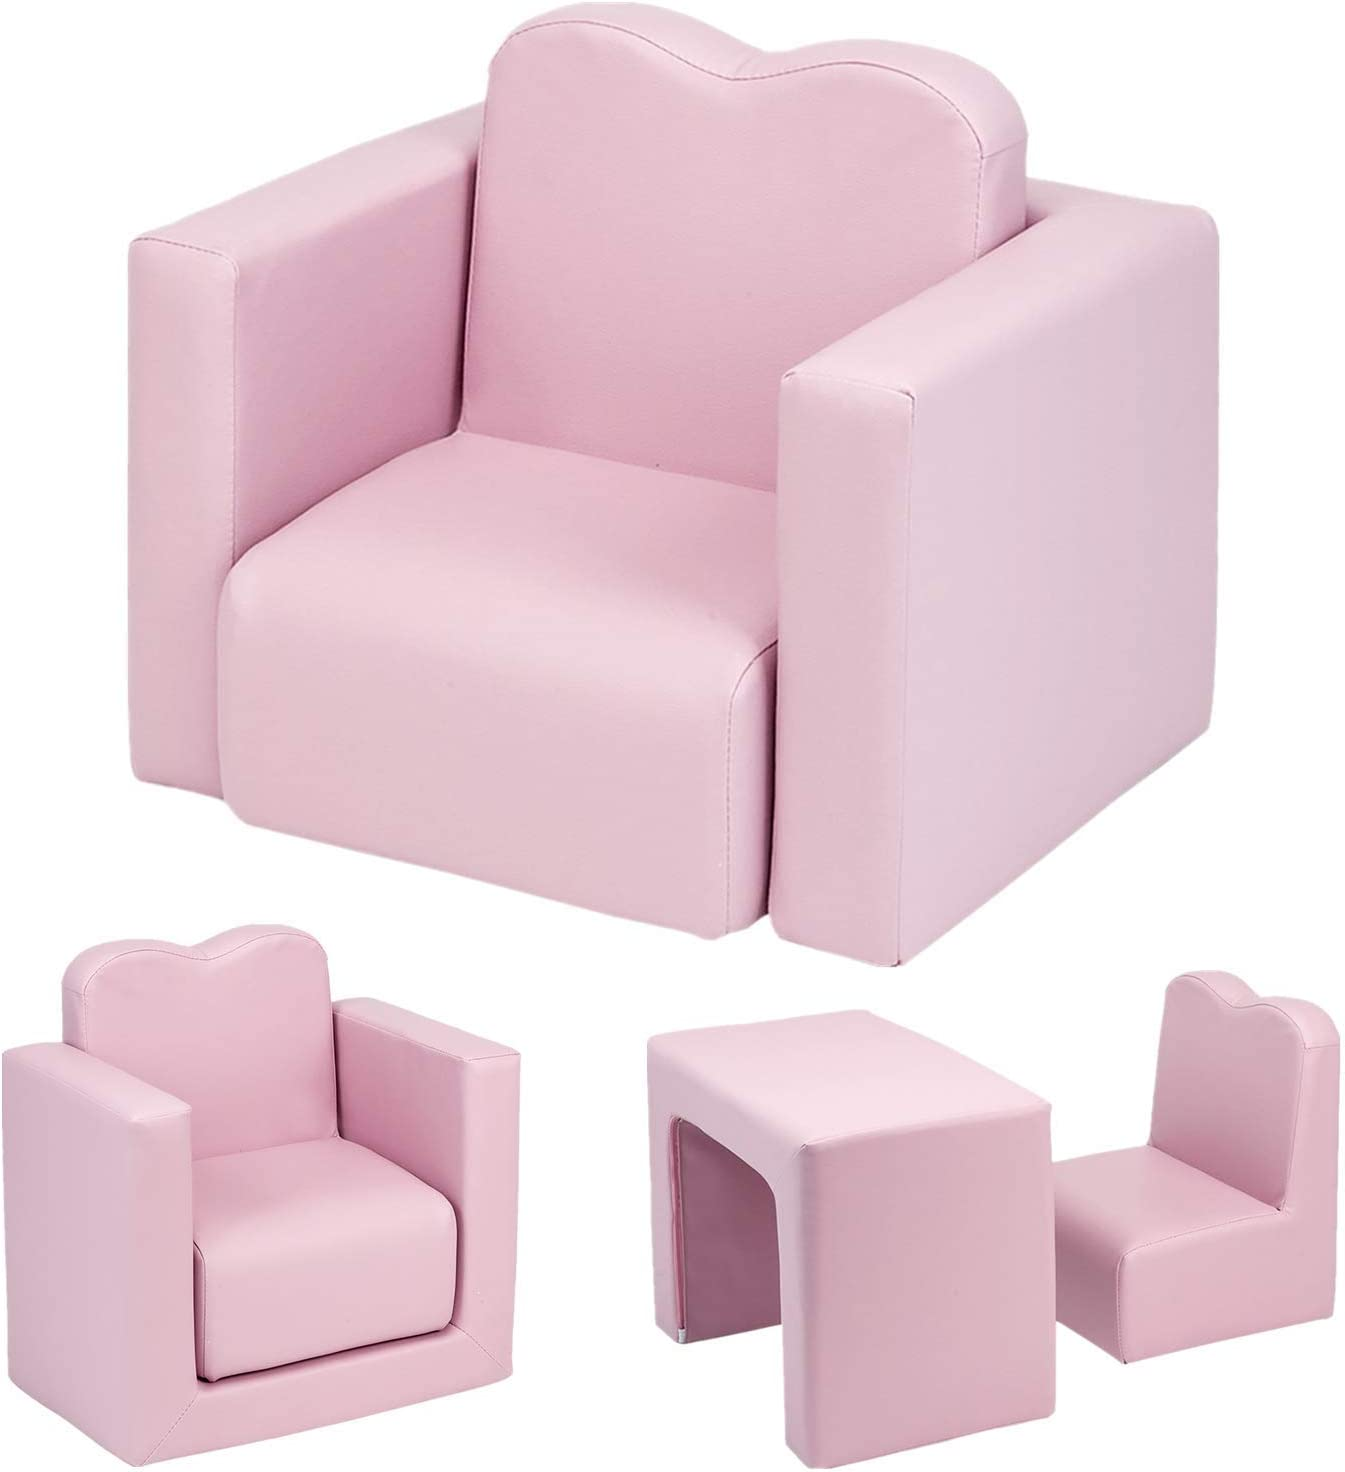 Multifunctional 2 in1 Kids Sofa, Environmental Friendly PVC Toddler Children's Armchair Sofa Living Room Bedroom Furniture Lightweight Padded Table & Chair Set for Girls & Boys